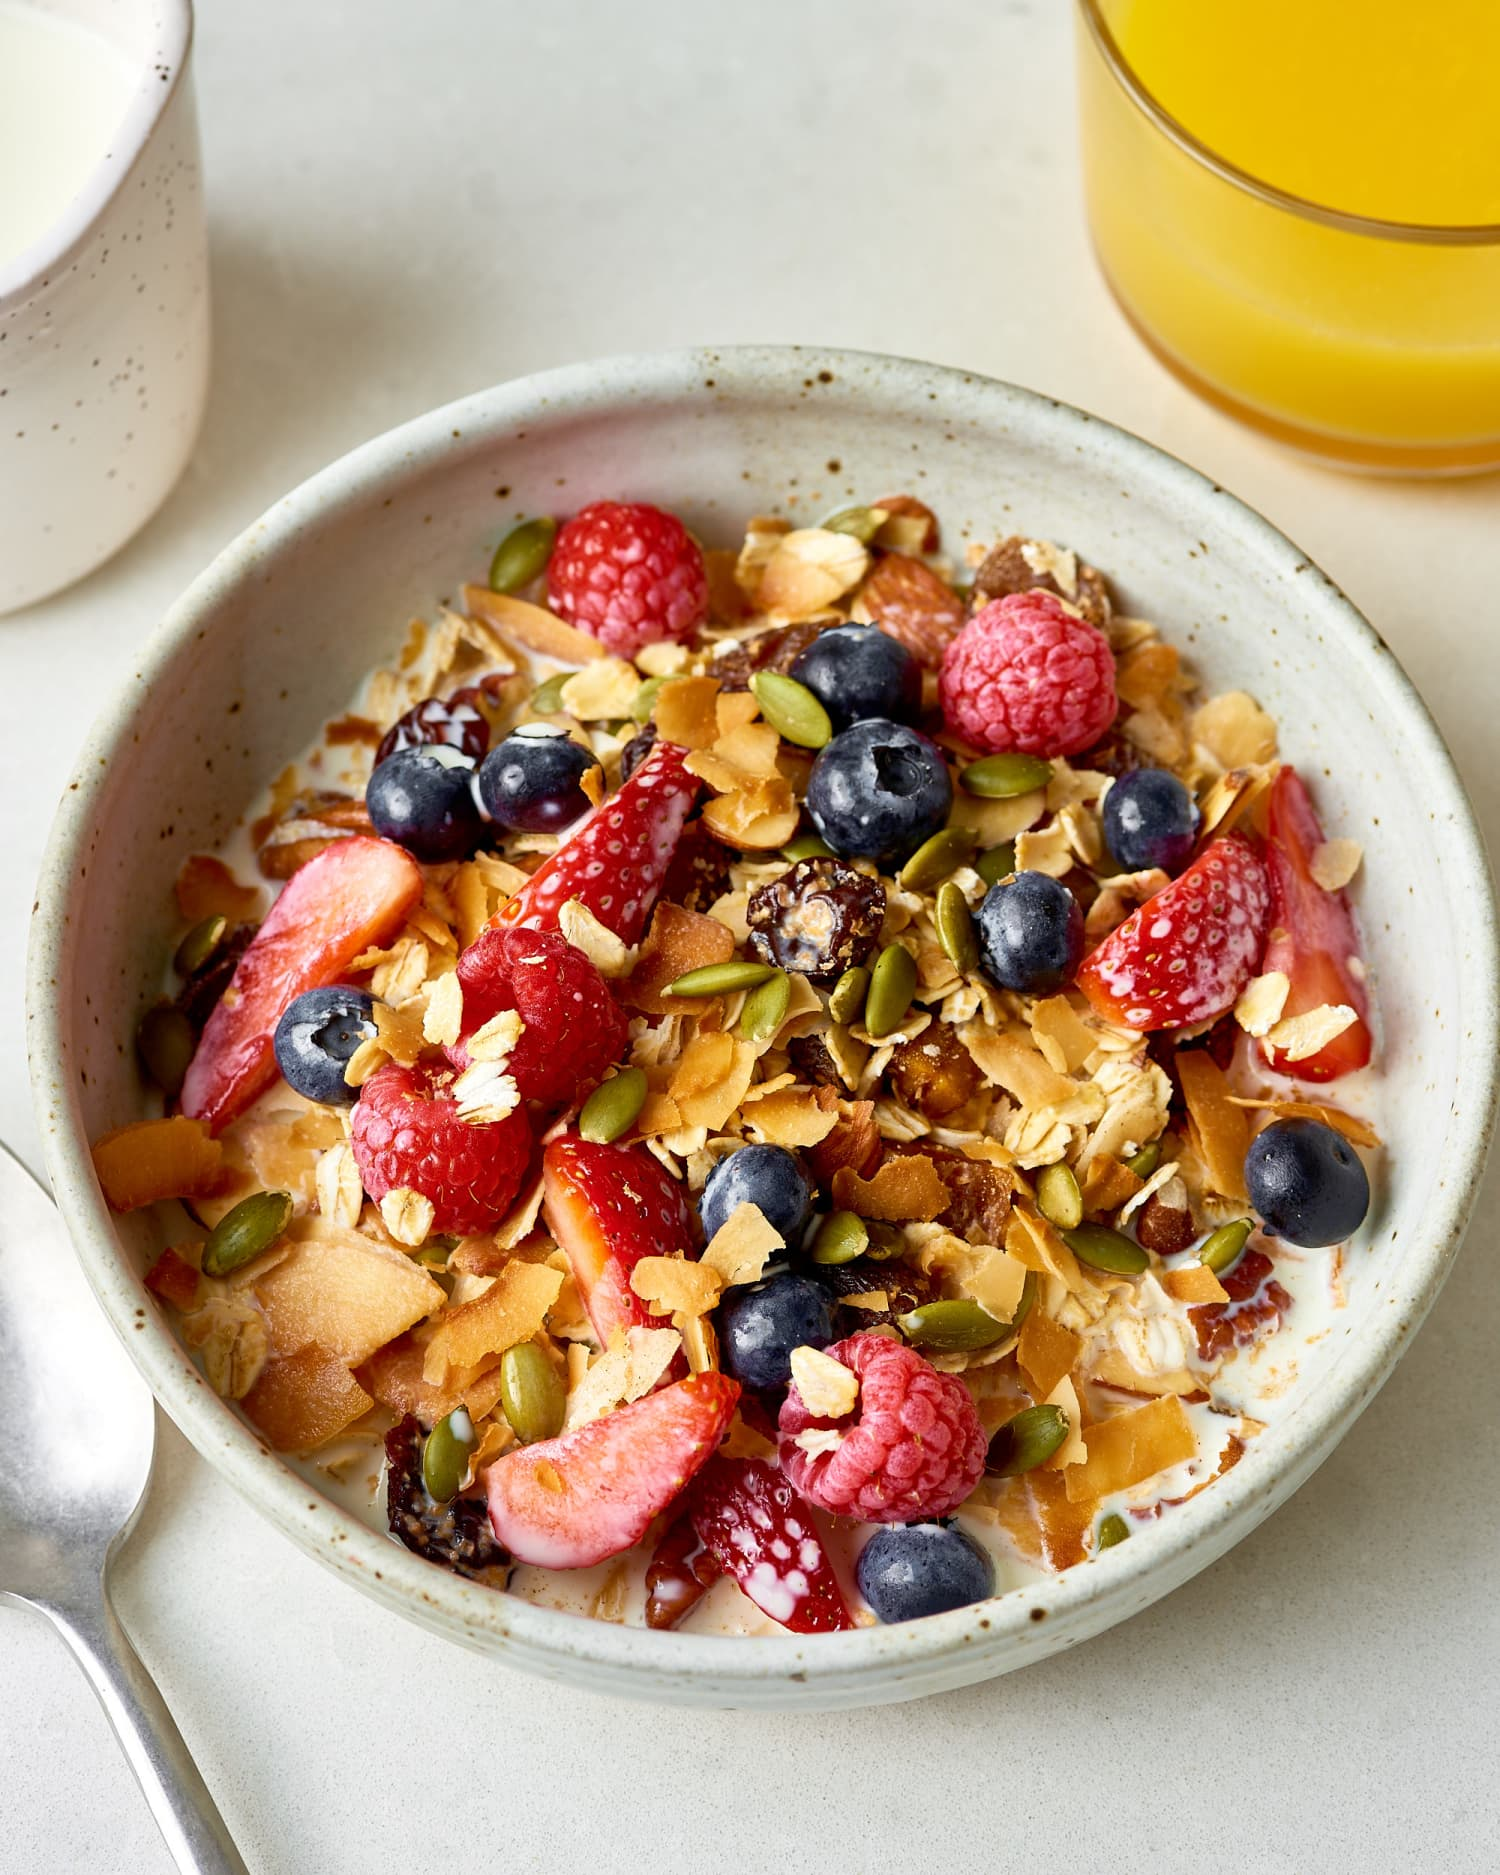 Protein-Packed Muesli Is the Ultimate Make-Ahead Breakfast